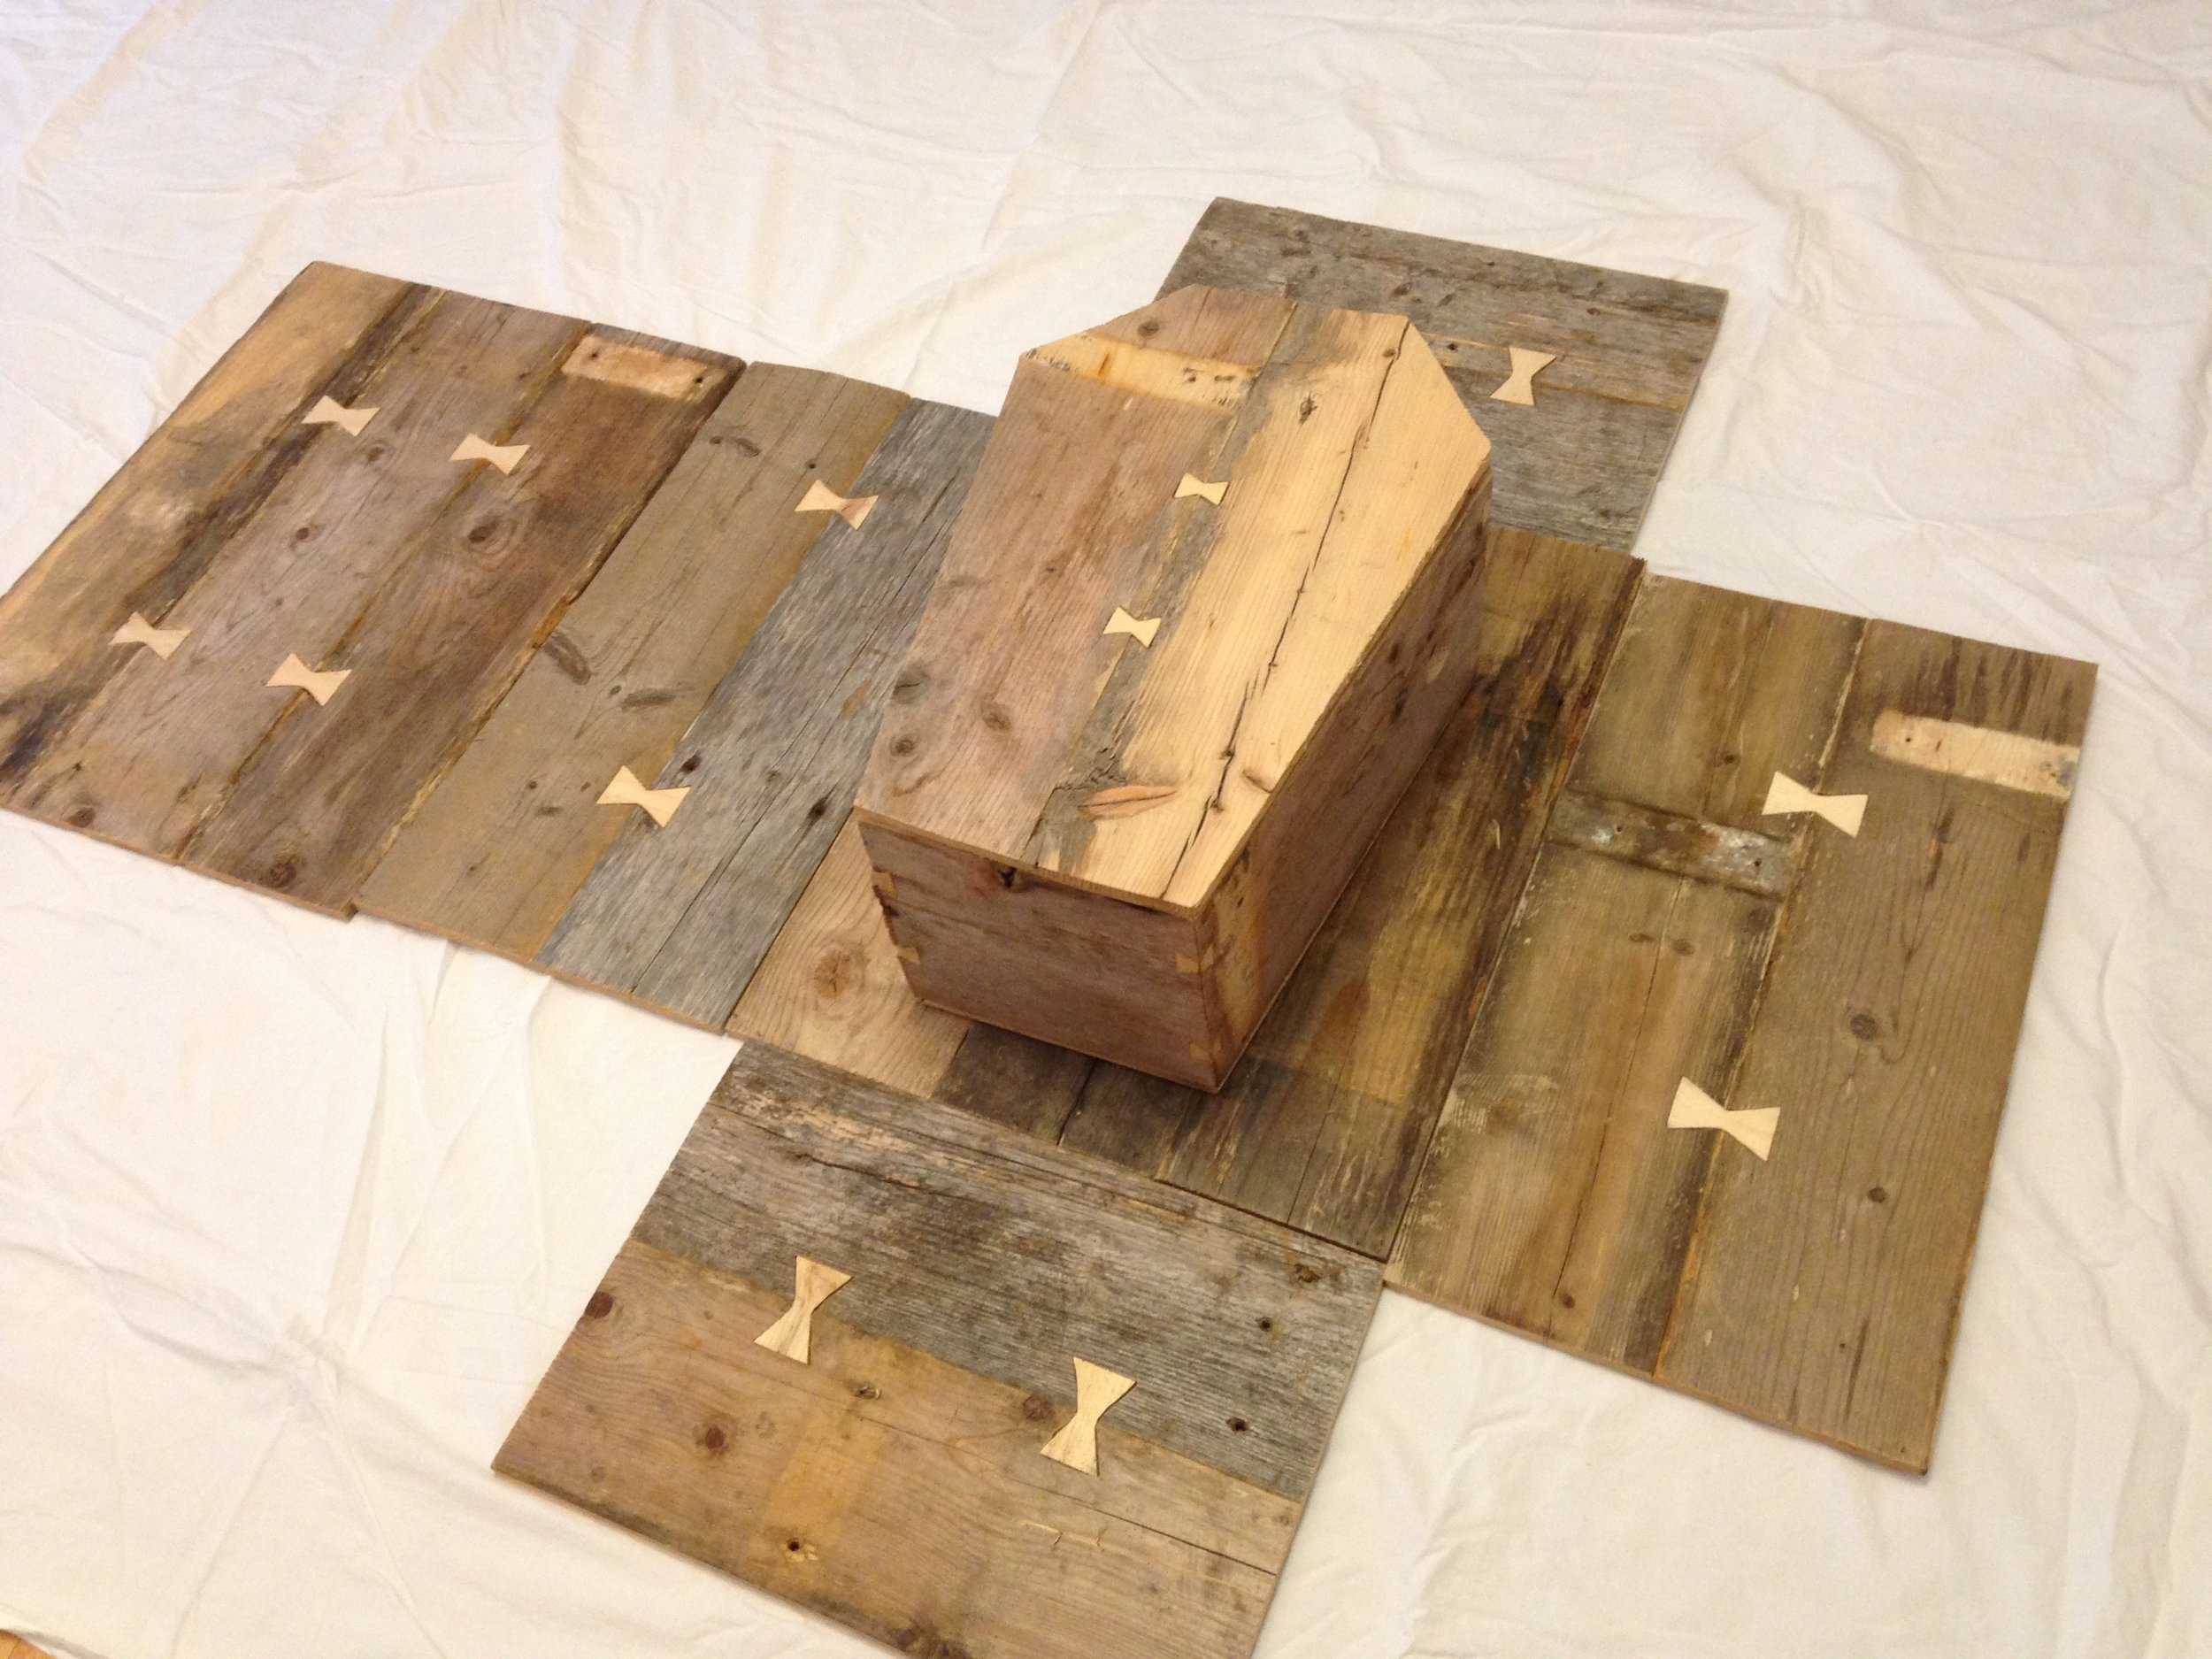 Box folds open